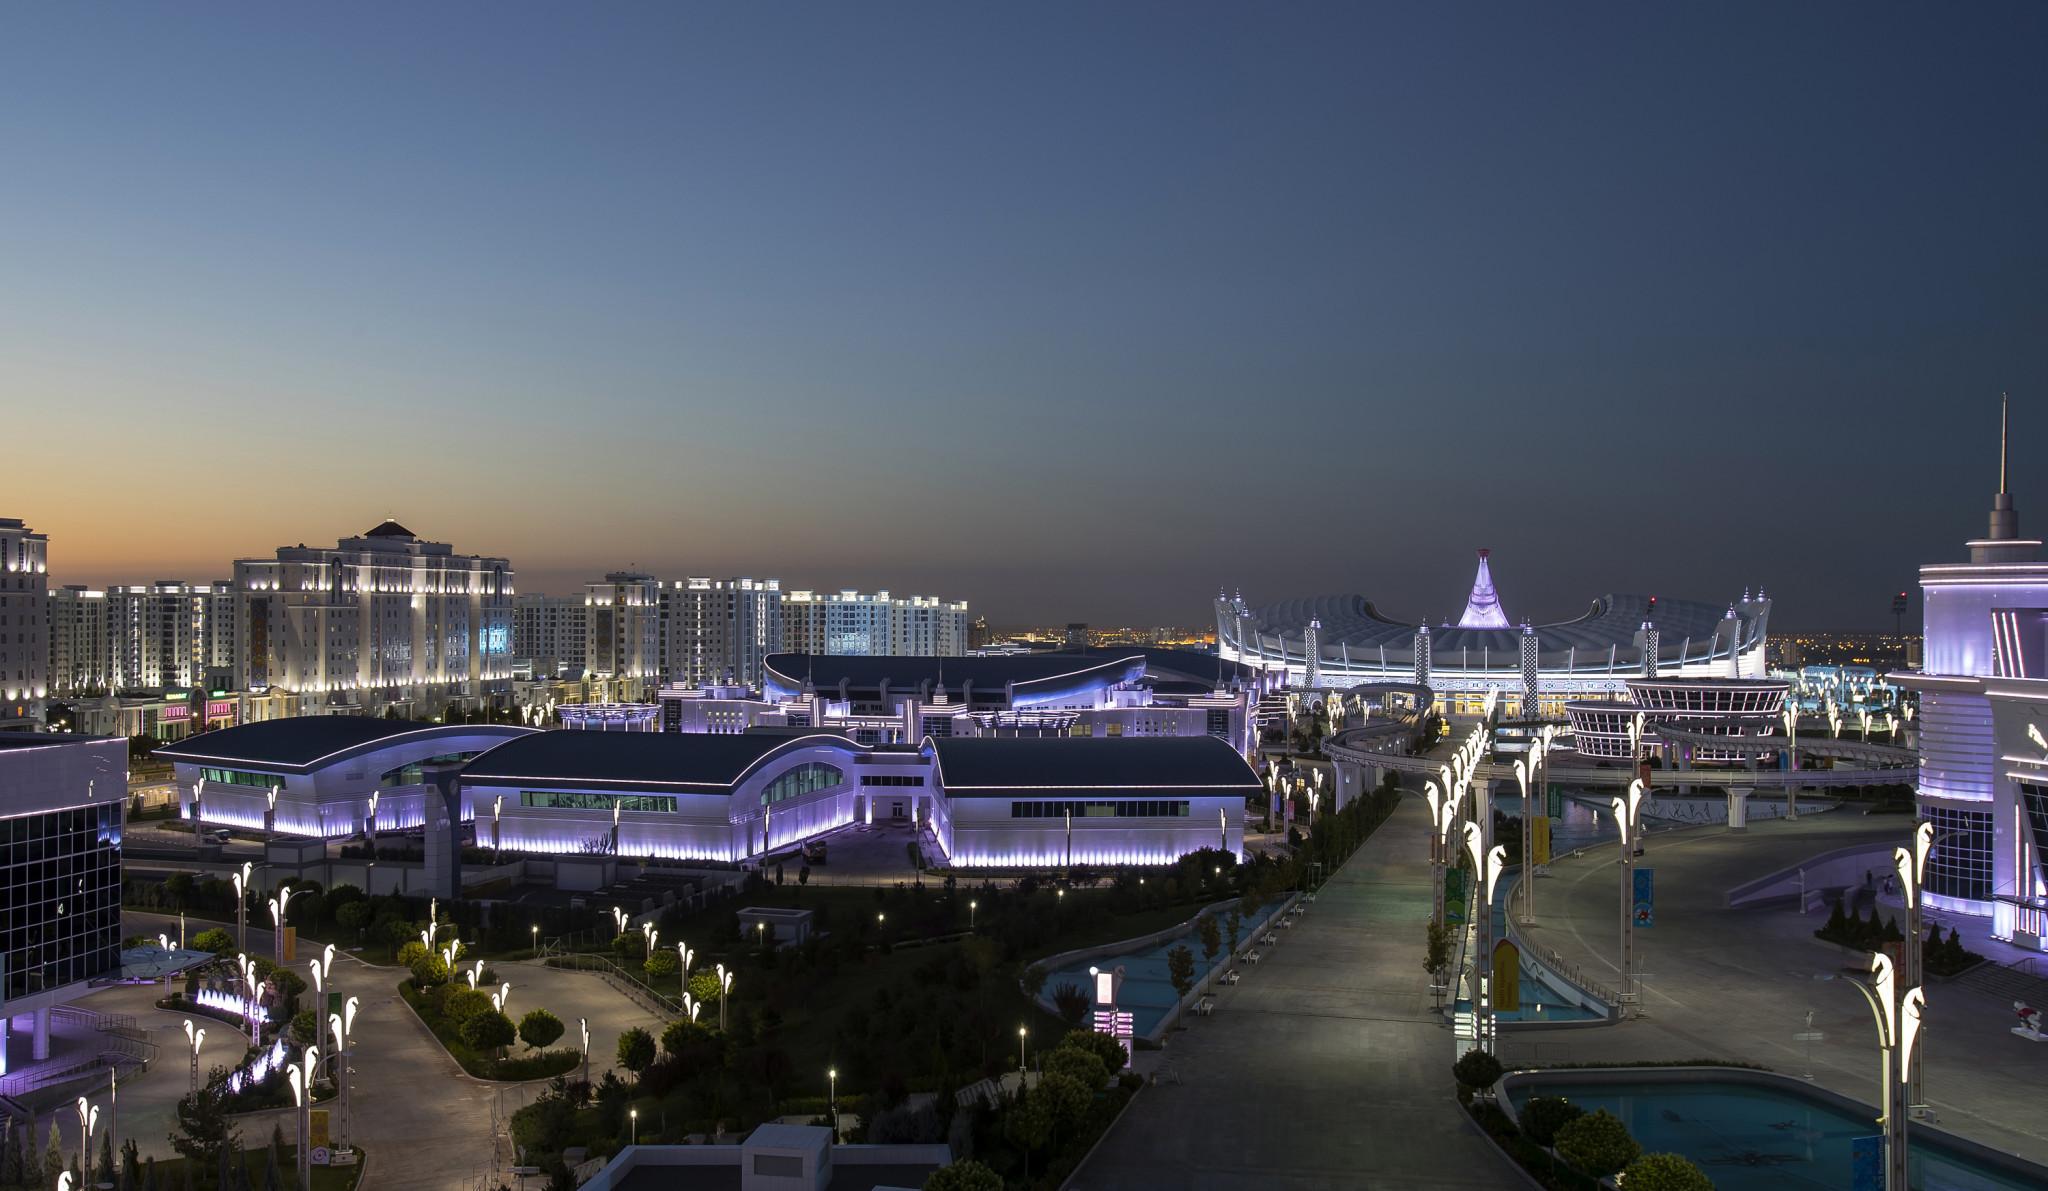 Tomorrow will see the last day of competition held at Ashgabat 2017 ©Ashgabat 2017/Angelos Zymaras/Laurel International Management